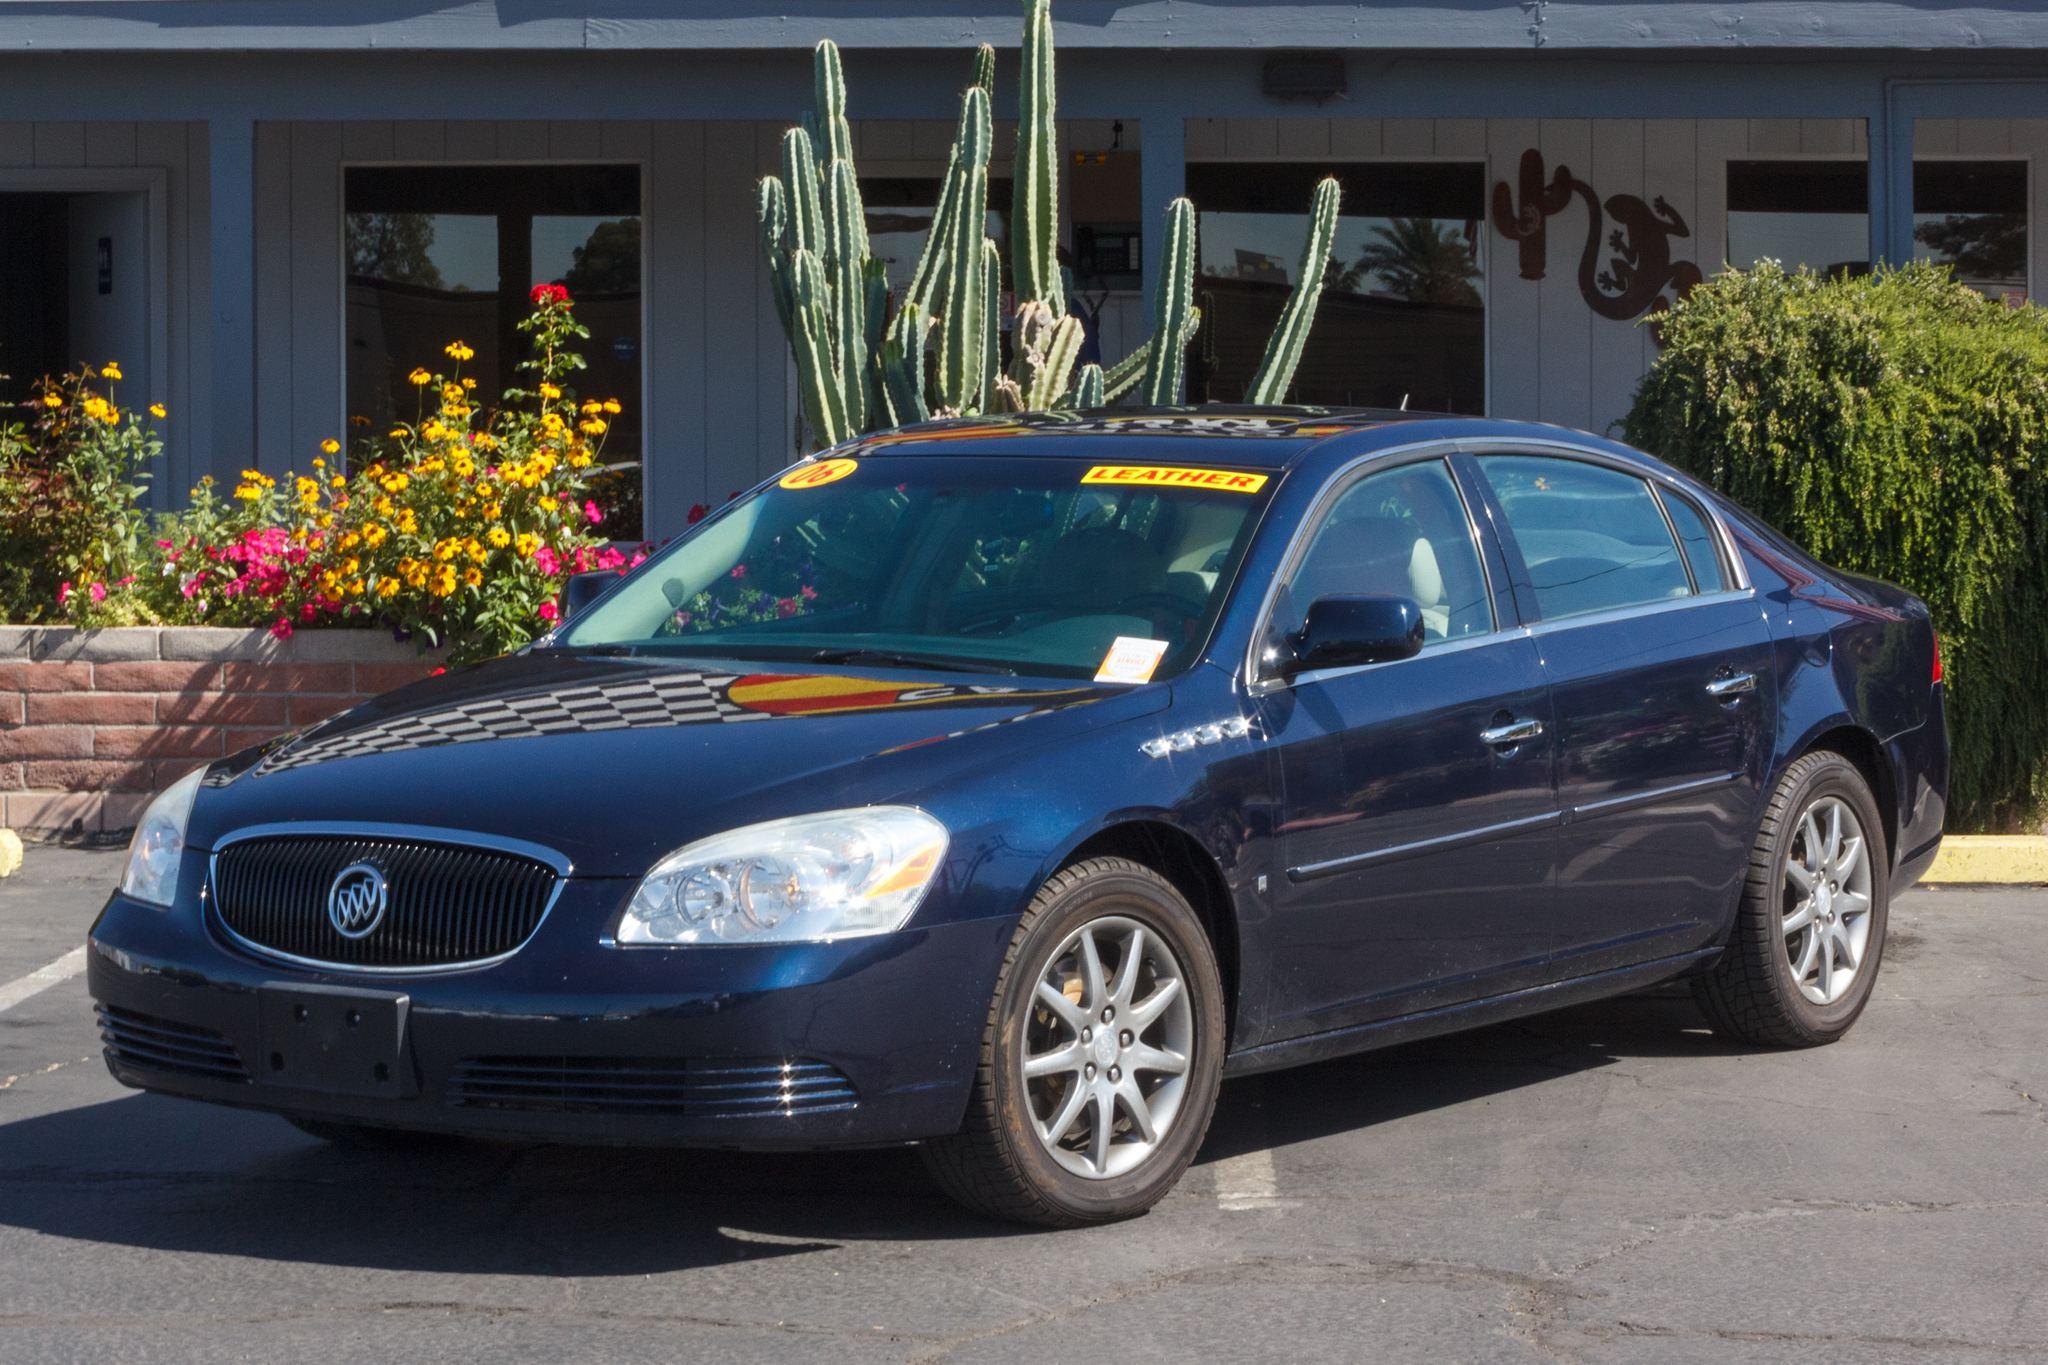 Photo of 2006 Buick Lucerne 4d Sedan CXL V8